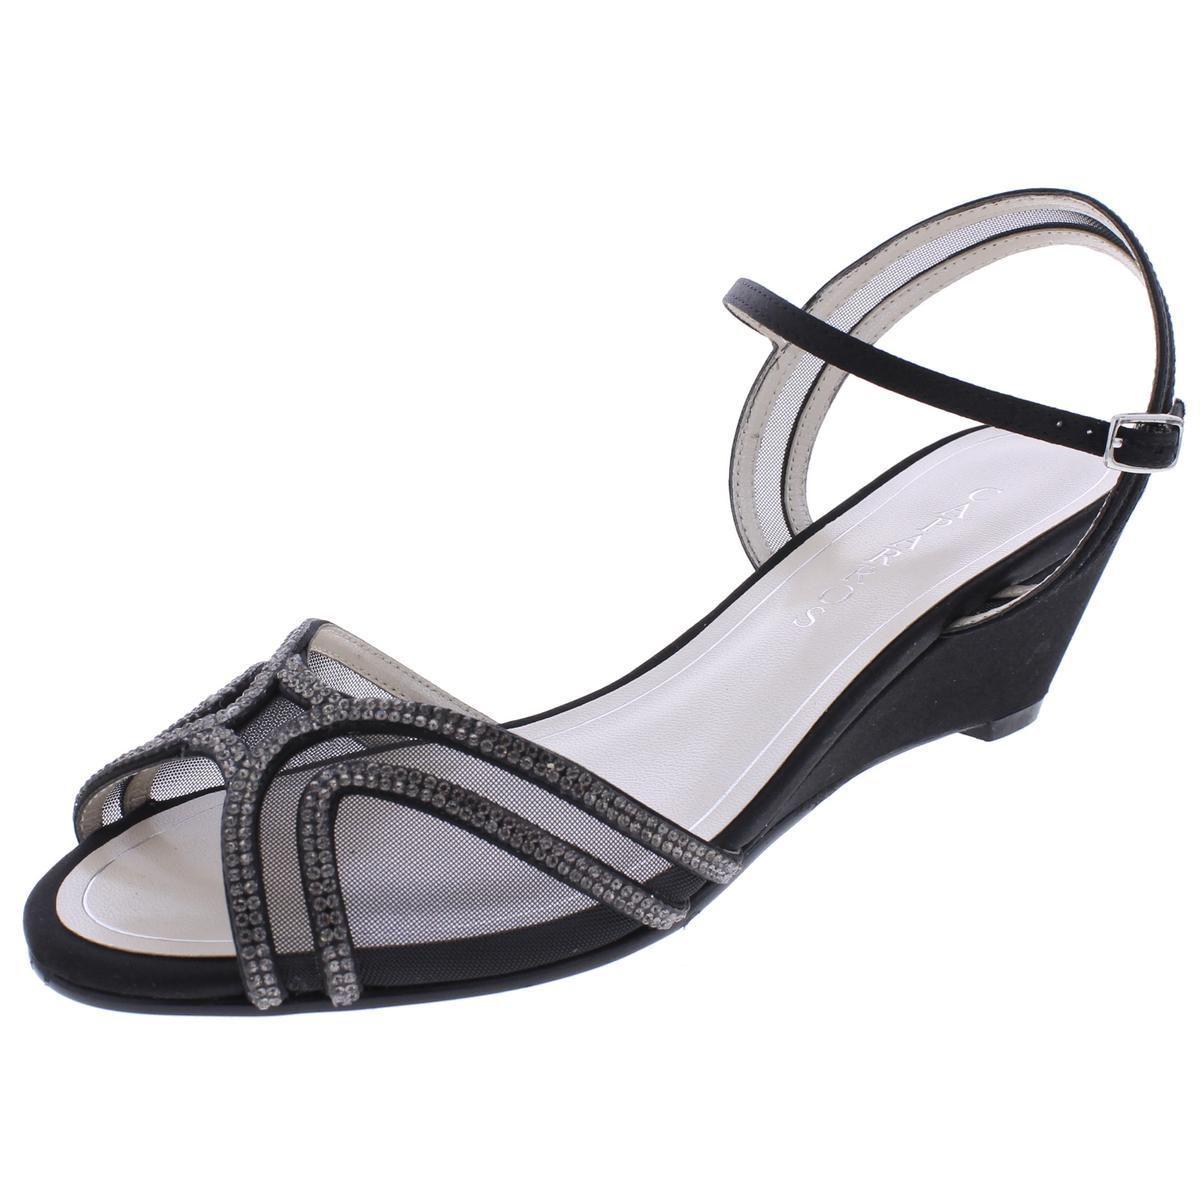 37f379f5391 Lyst - Caparros Womens Hilton Rhinestone Peep-toe Wedge Sandals in Black